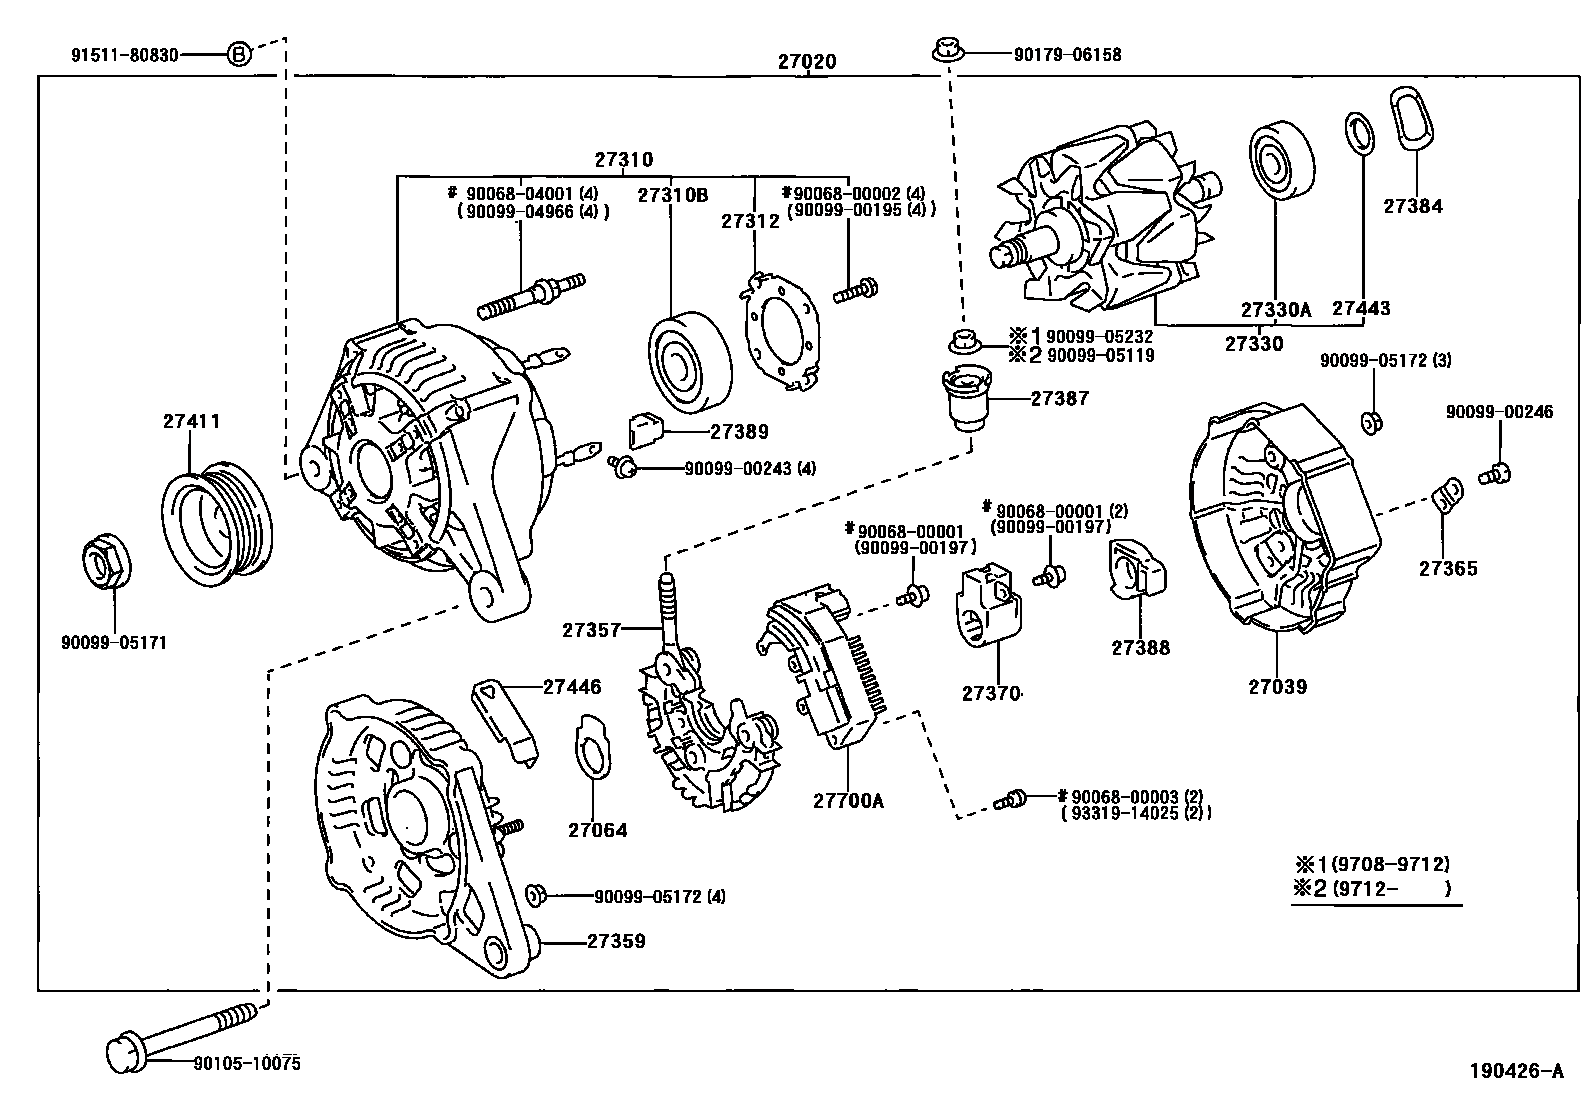 small resolution of diy 1999 toyota corolla ve 1zzfe engine alternator exploded diagram 2003 ford f 250 engine diagram toyota corolla 2010 engine diagram